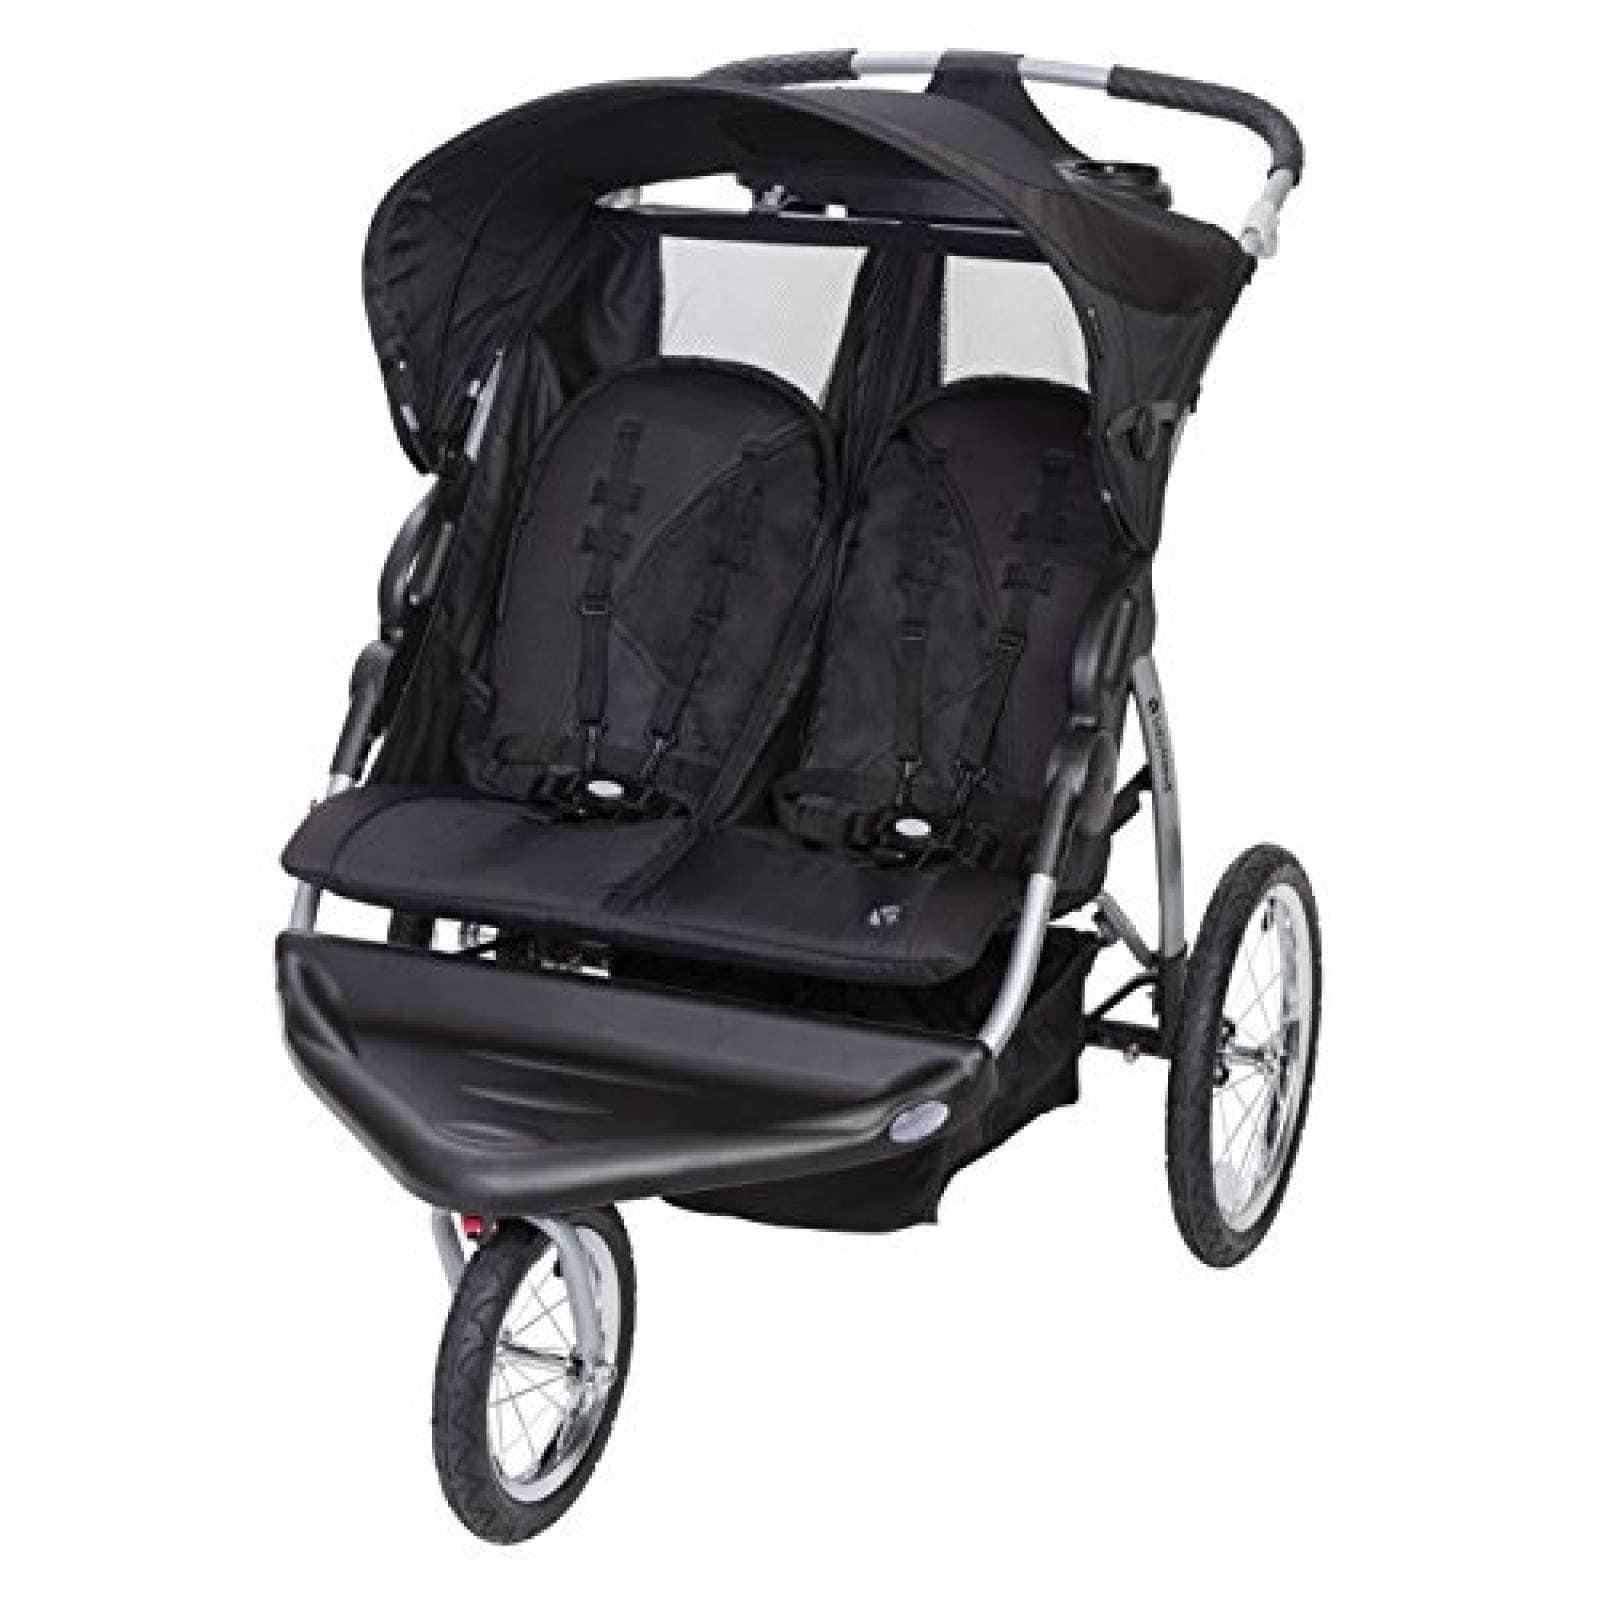 Carriola doble Baby Trend Expedition EX para trotar